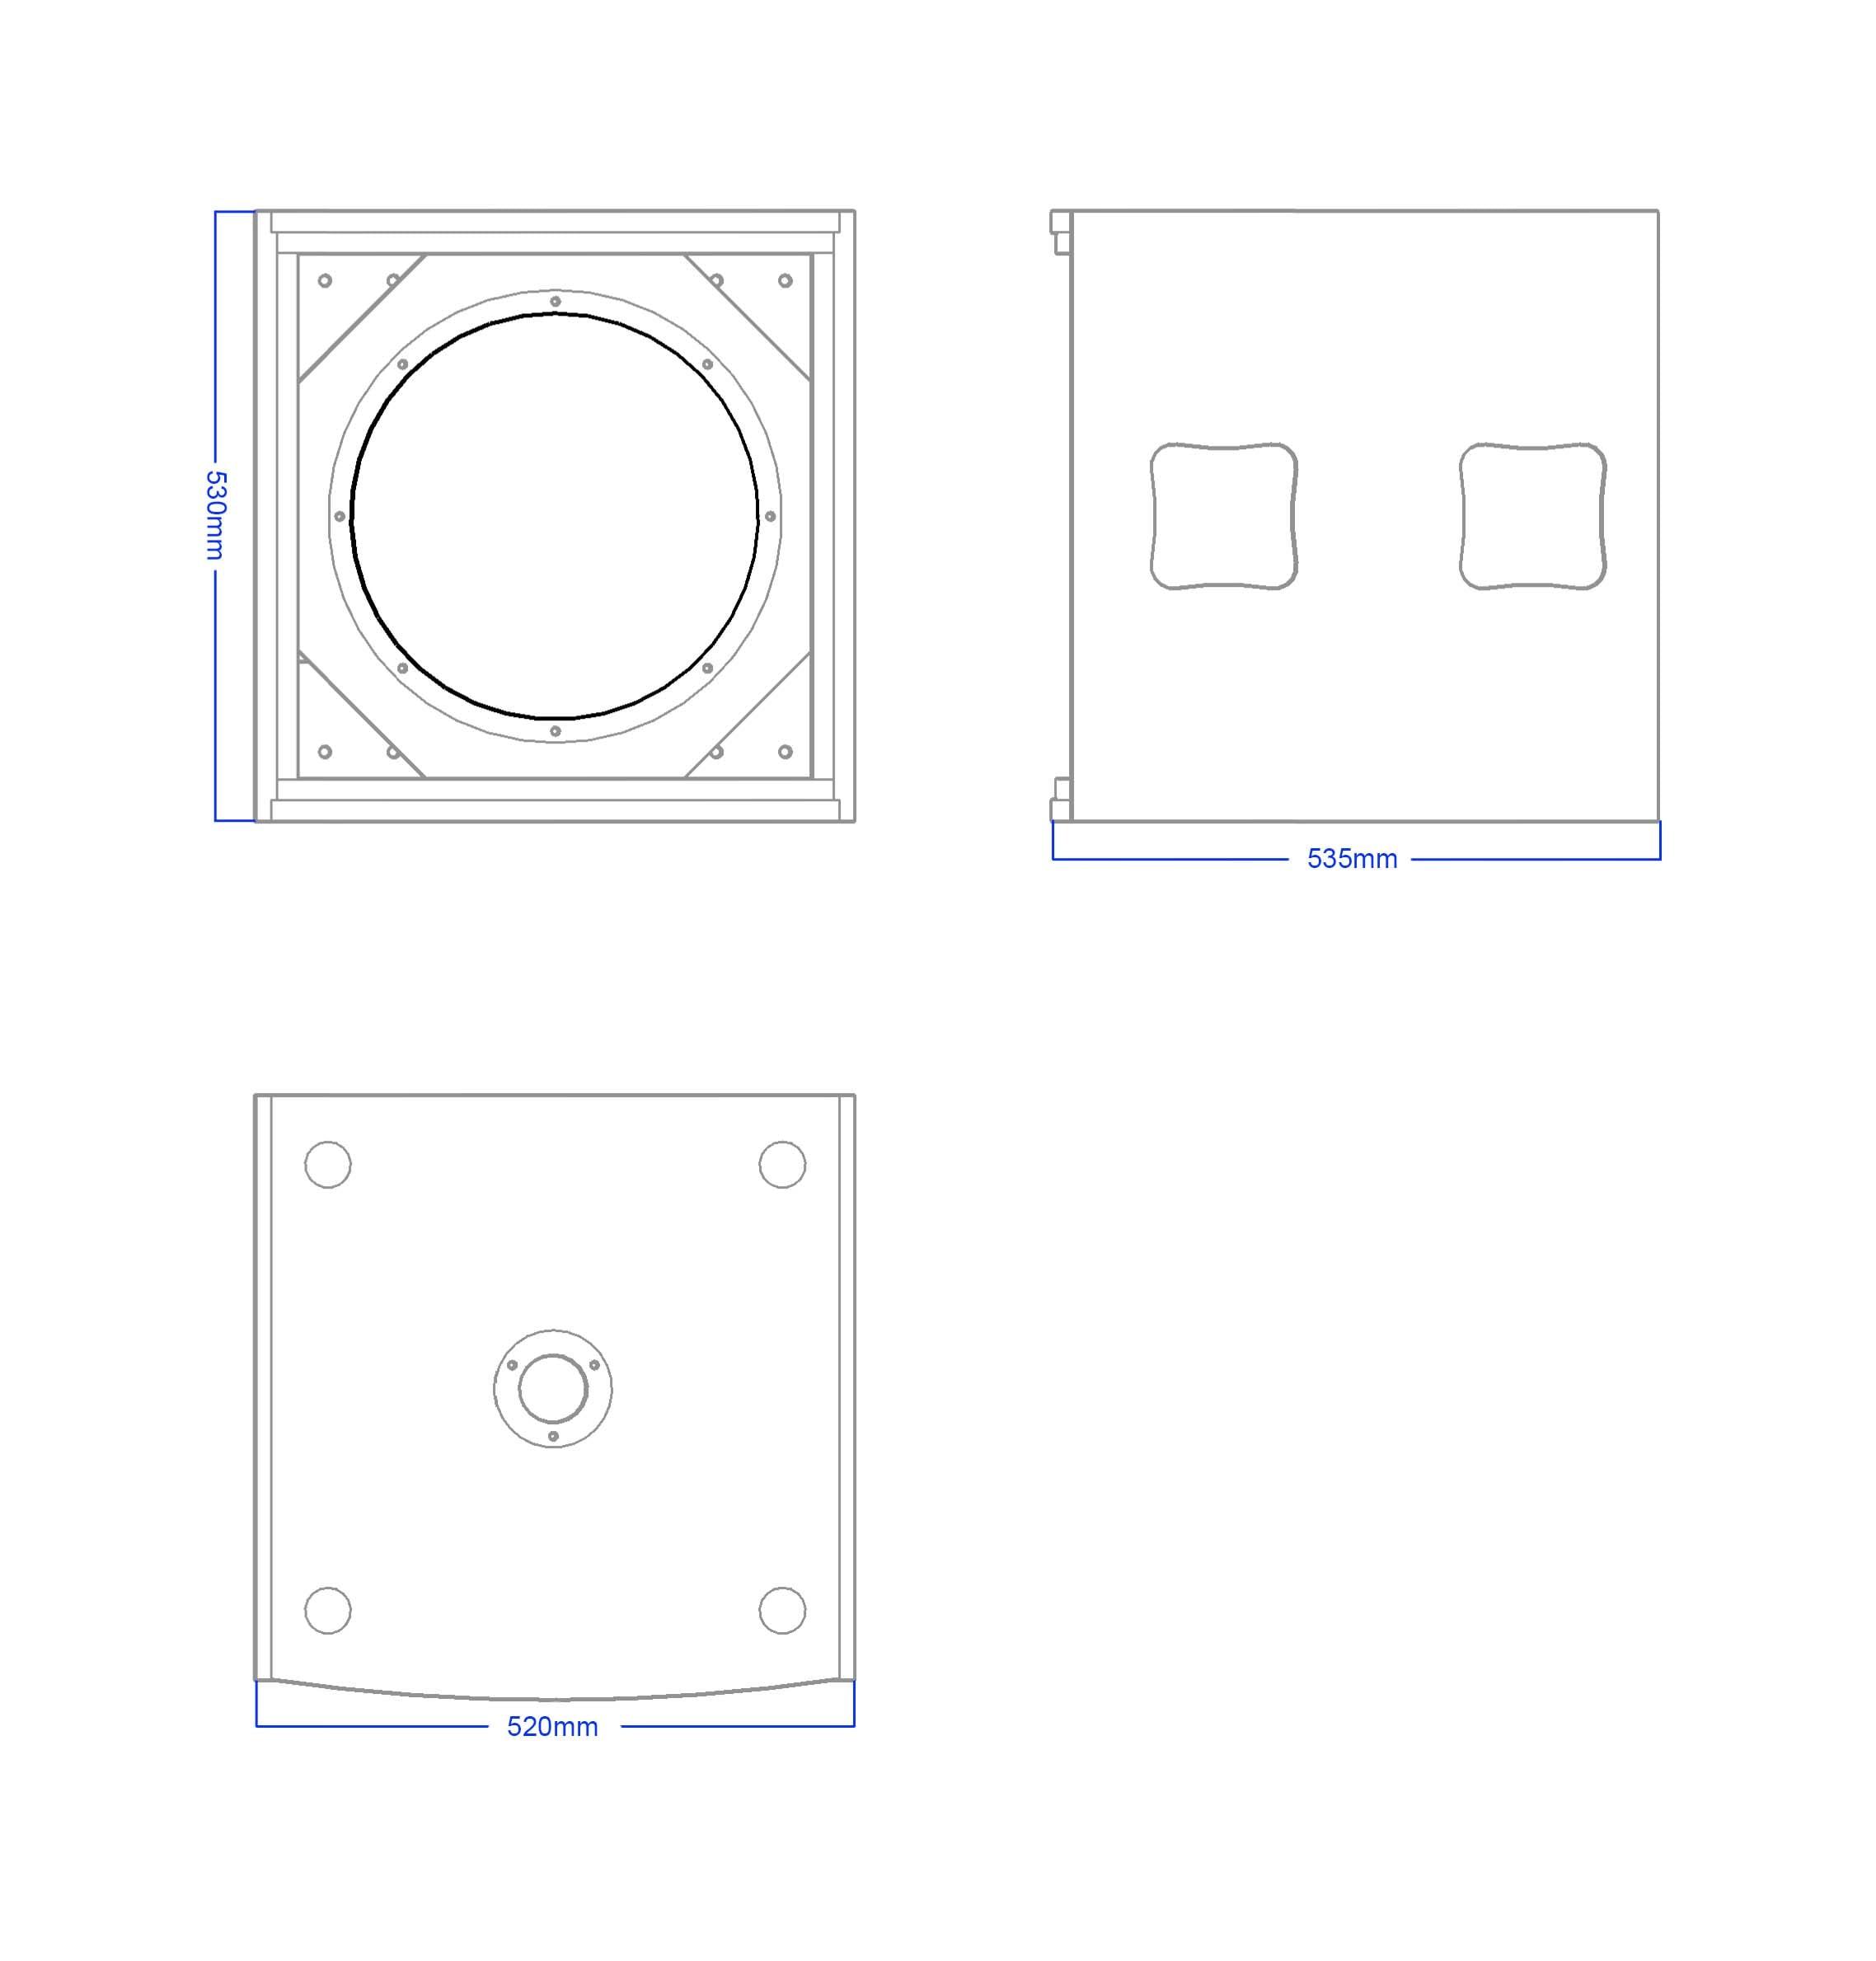 Apt SC15.1 Sub cabinet - 530, 535, 520mm